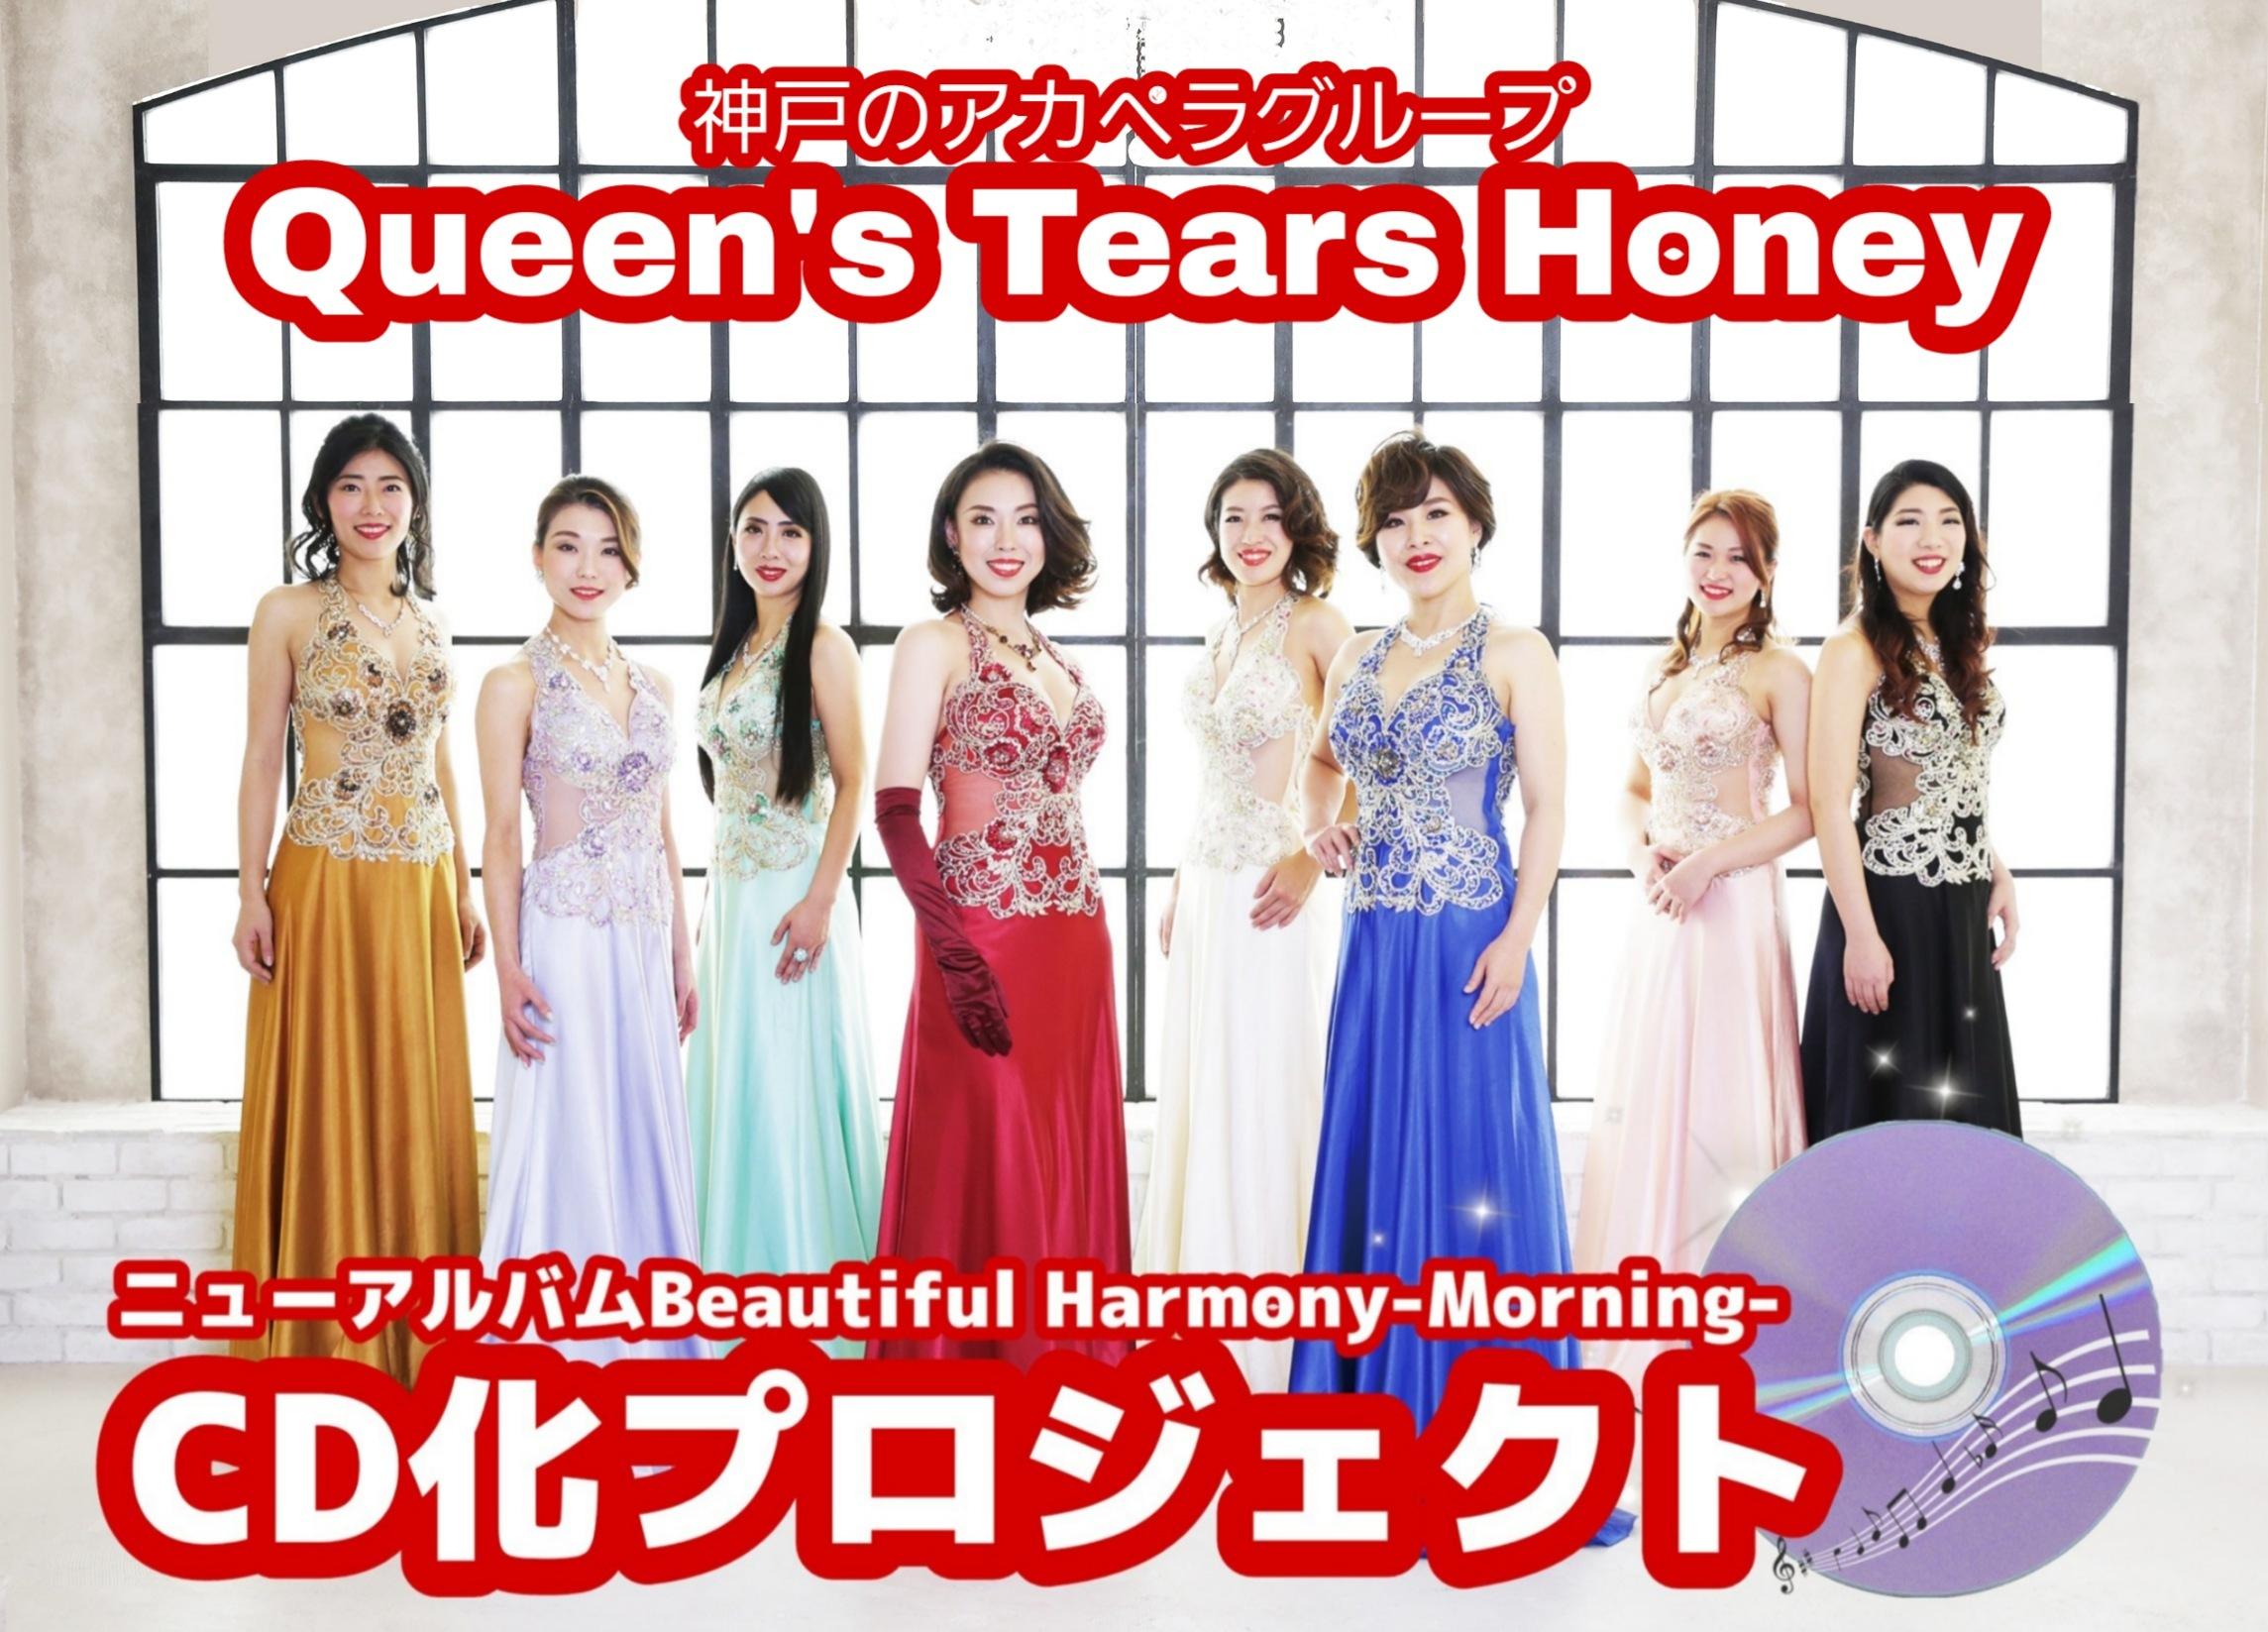 【Queen's Tears Honey】リリースした音源を形に残したい!Beautiful Harmony -Morning- CD化プロジェクト!!